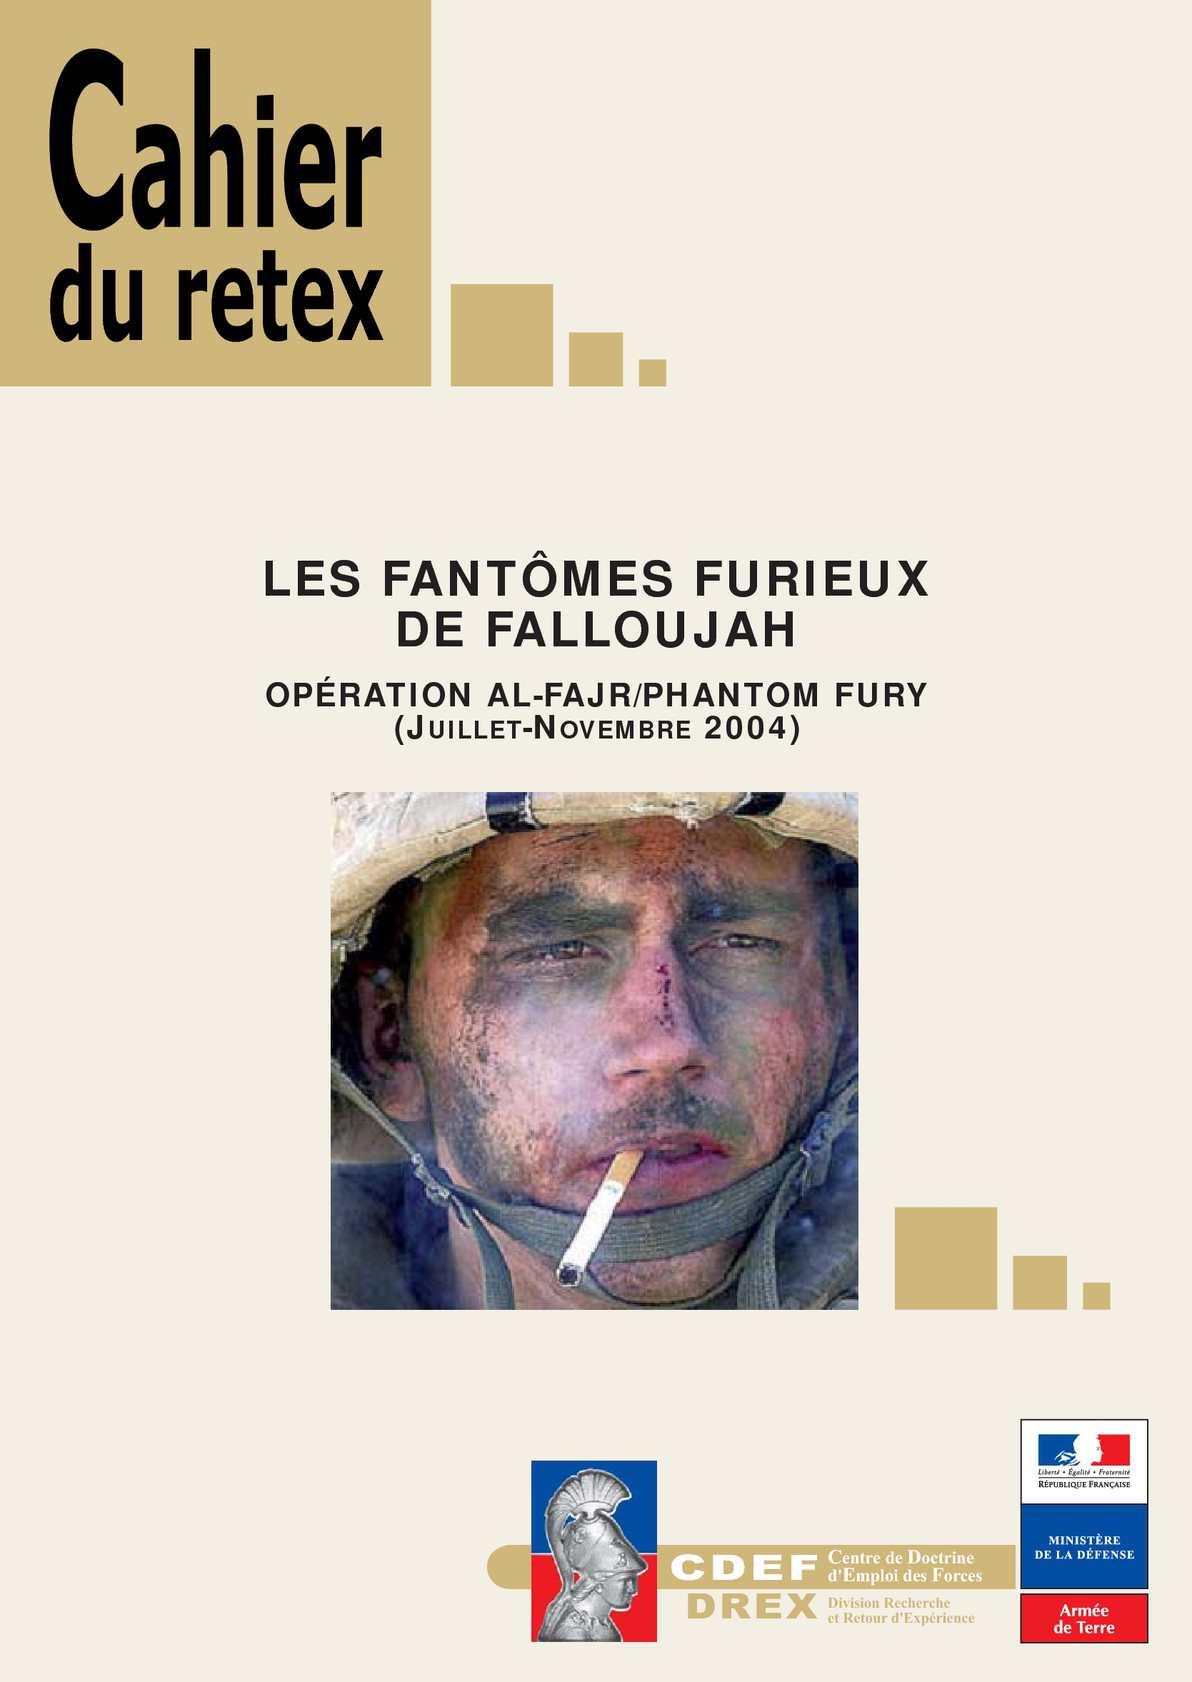 Les fantômes furieux de Falloujah (juillet-novembre 2004)